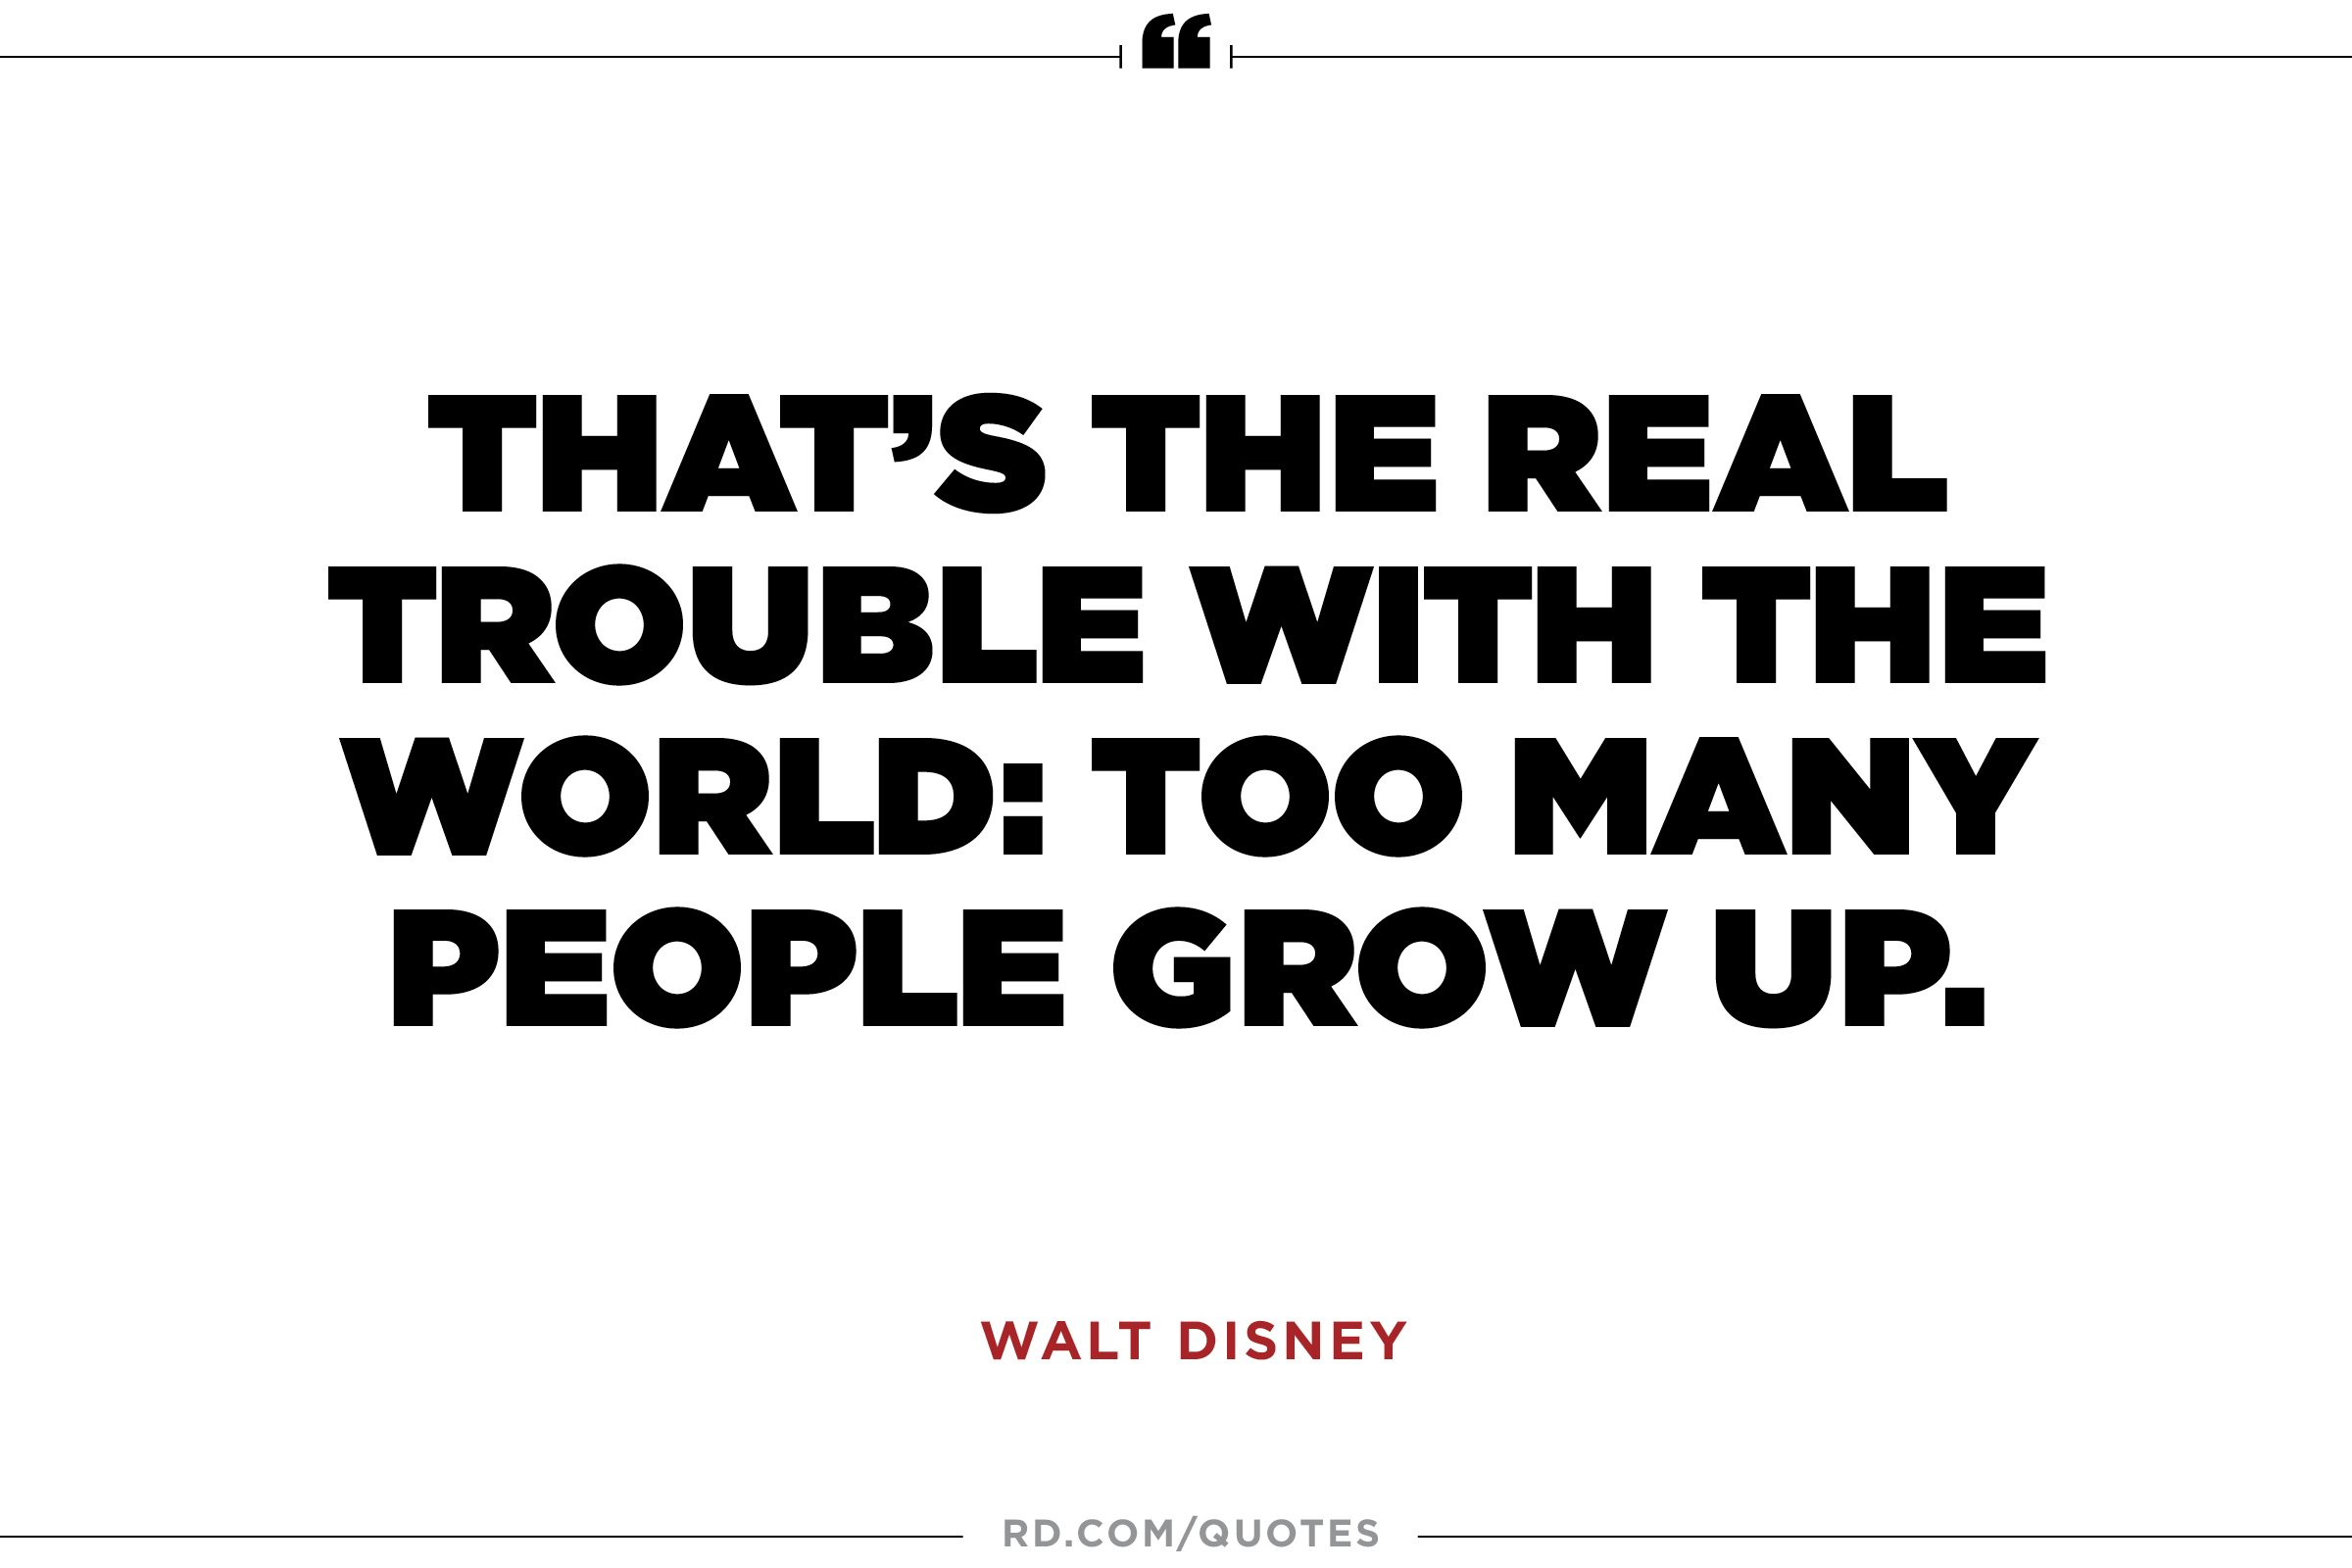 11 Inspiring Walt Disney Quotes | Reader's Digest